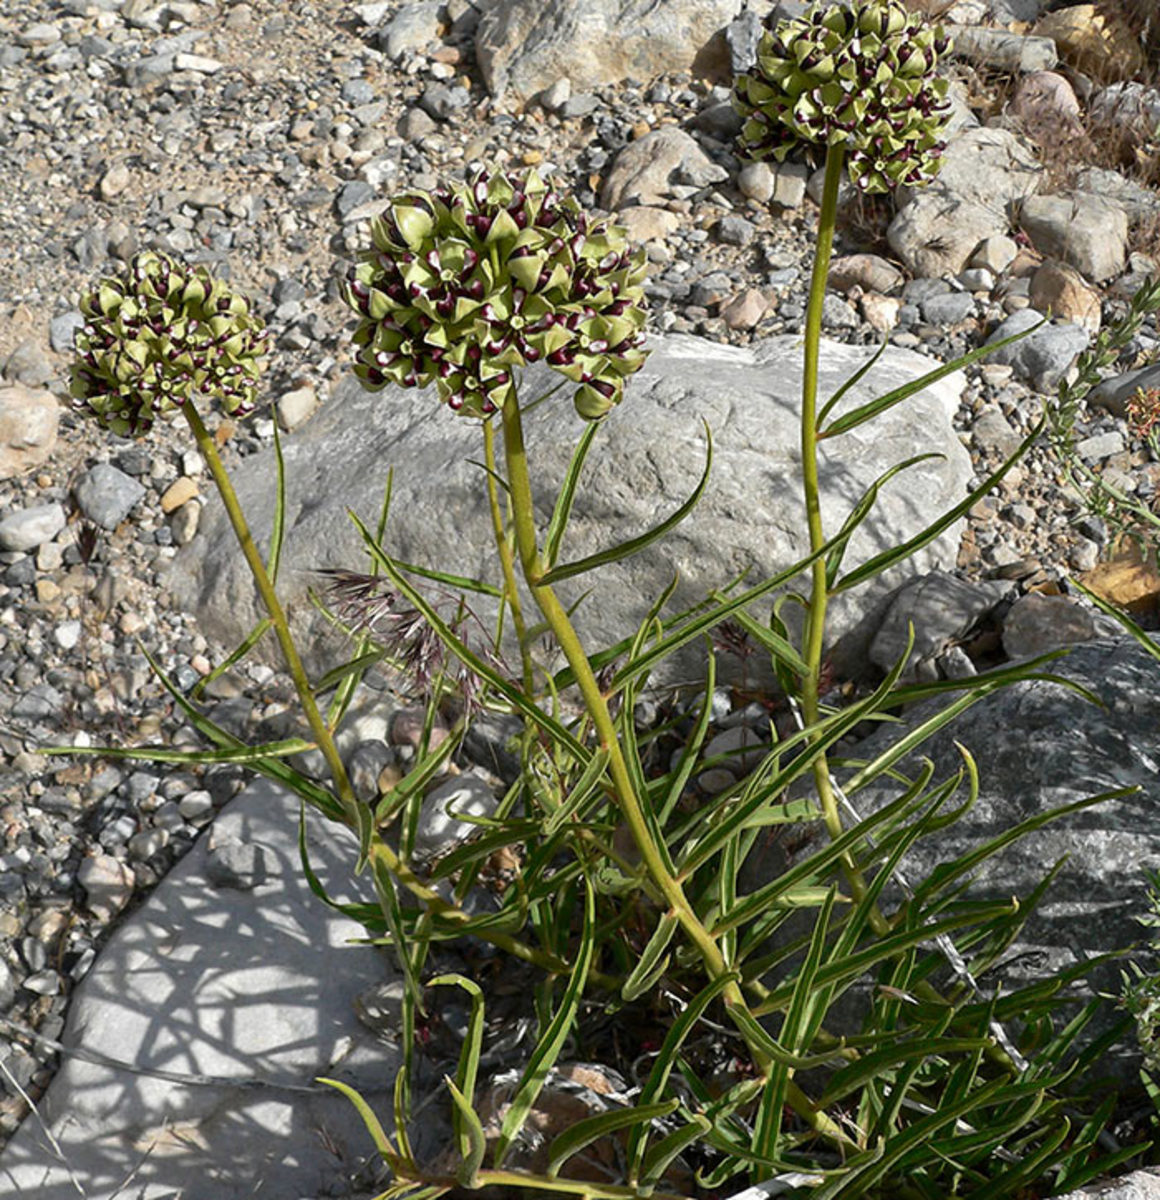 Above: Antelope-horn milkweed